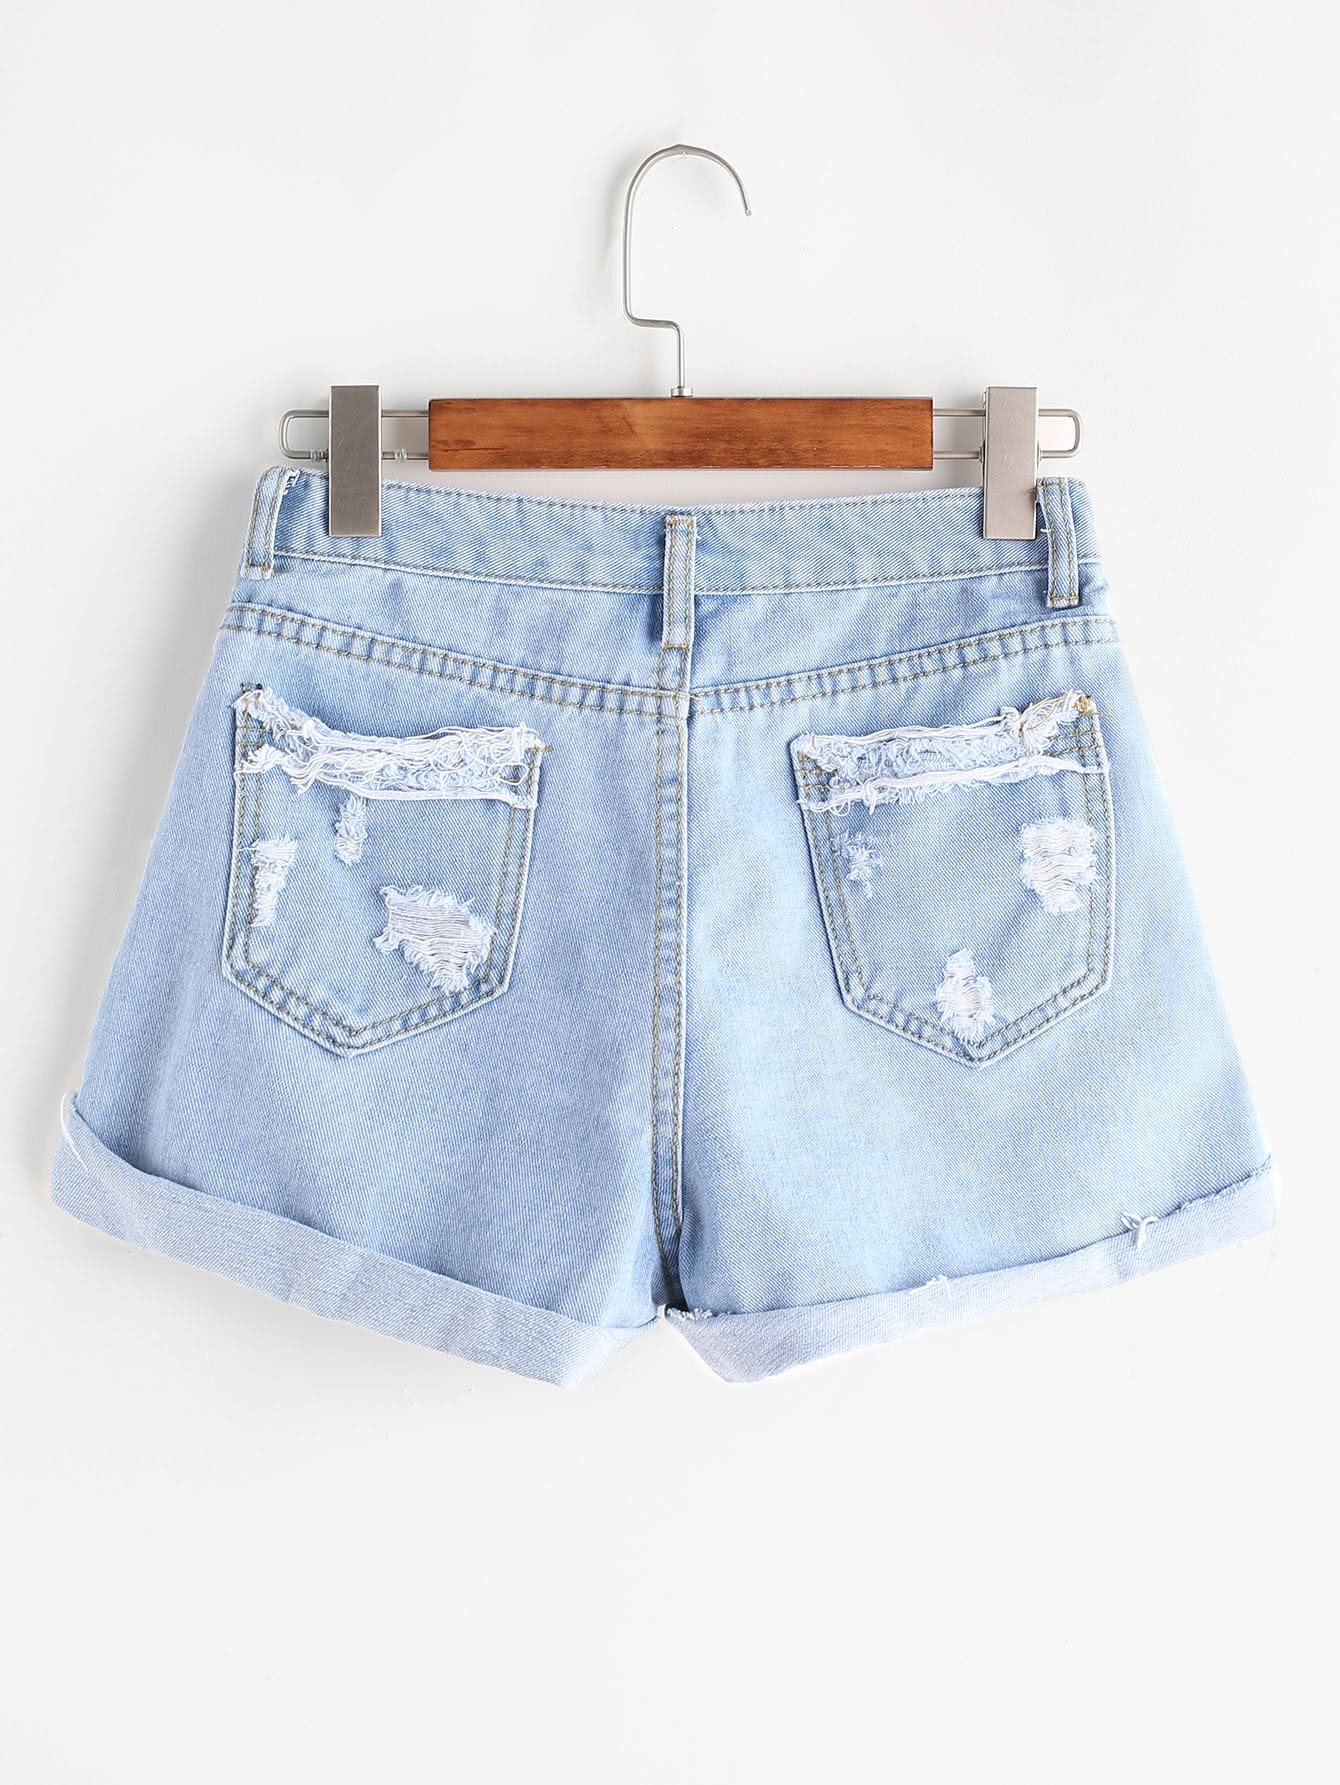 shorts170427001_2